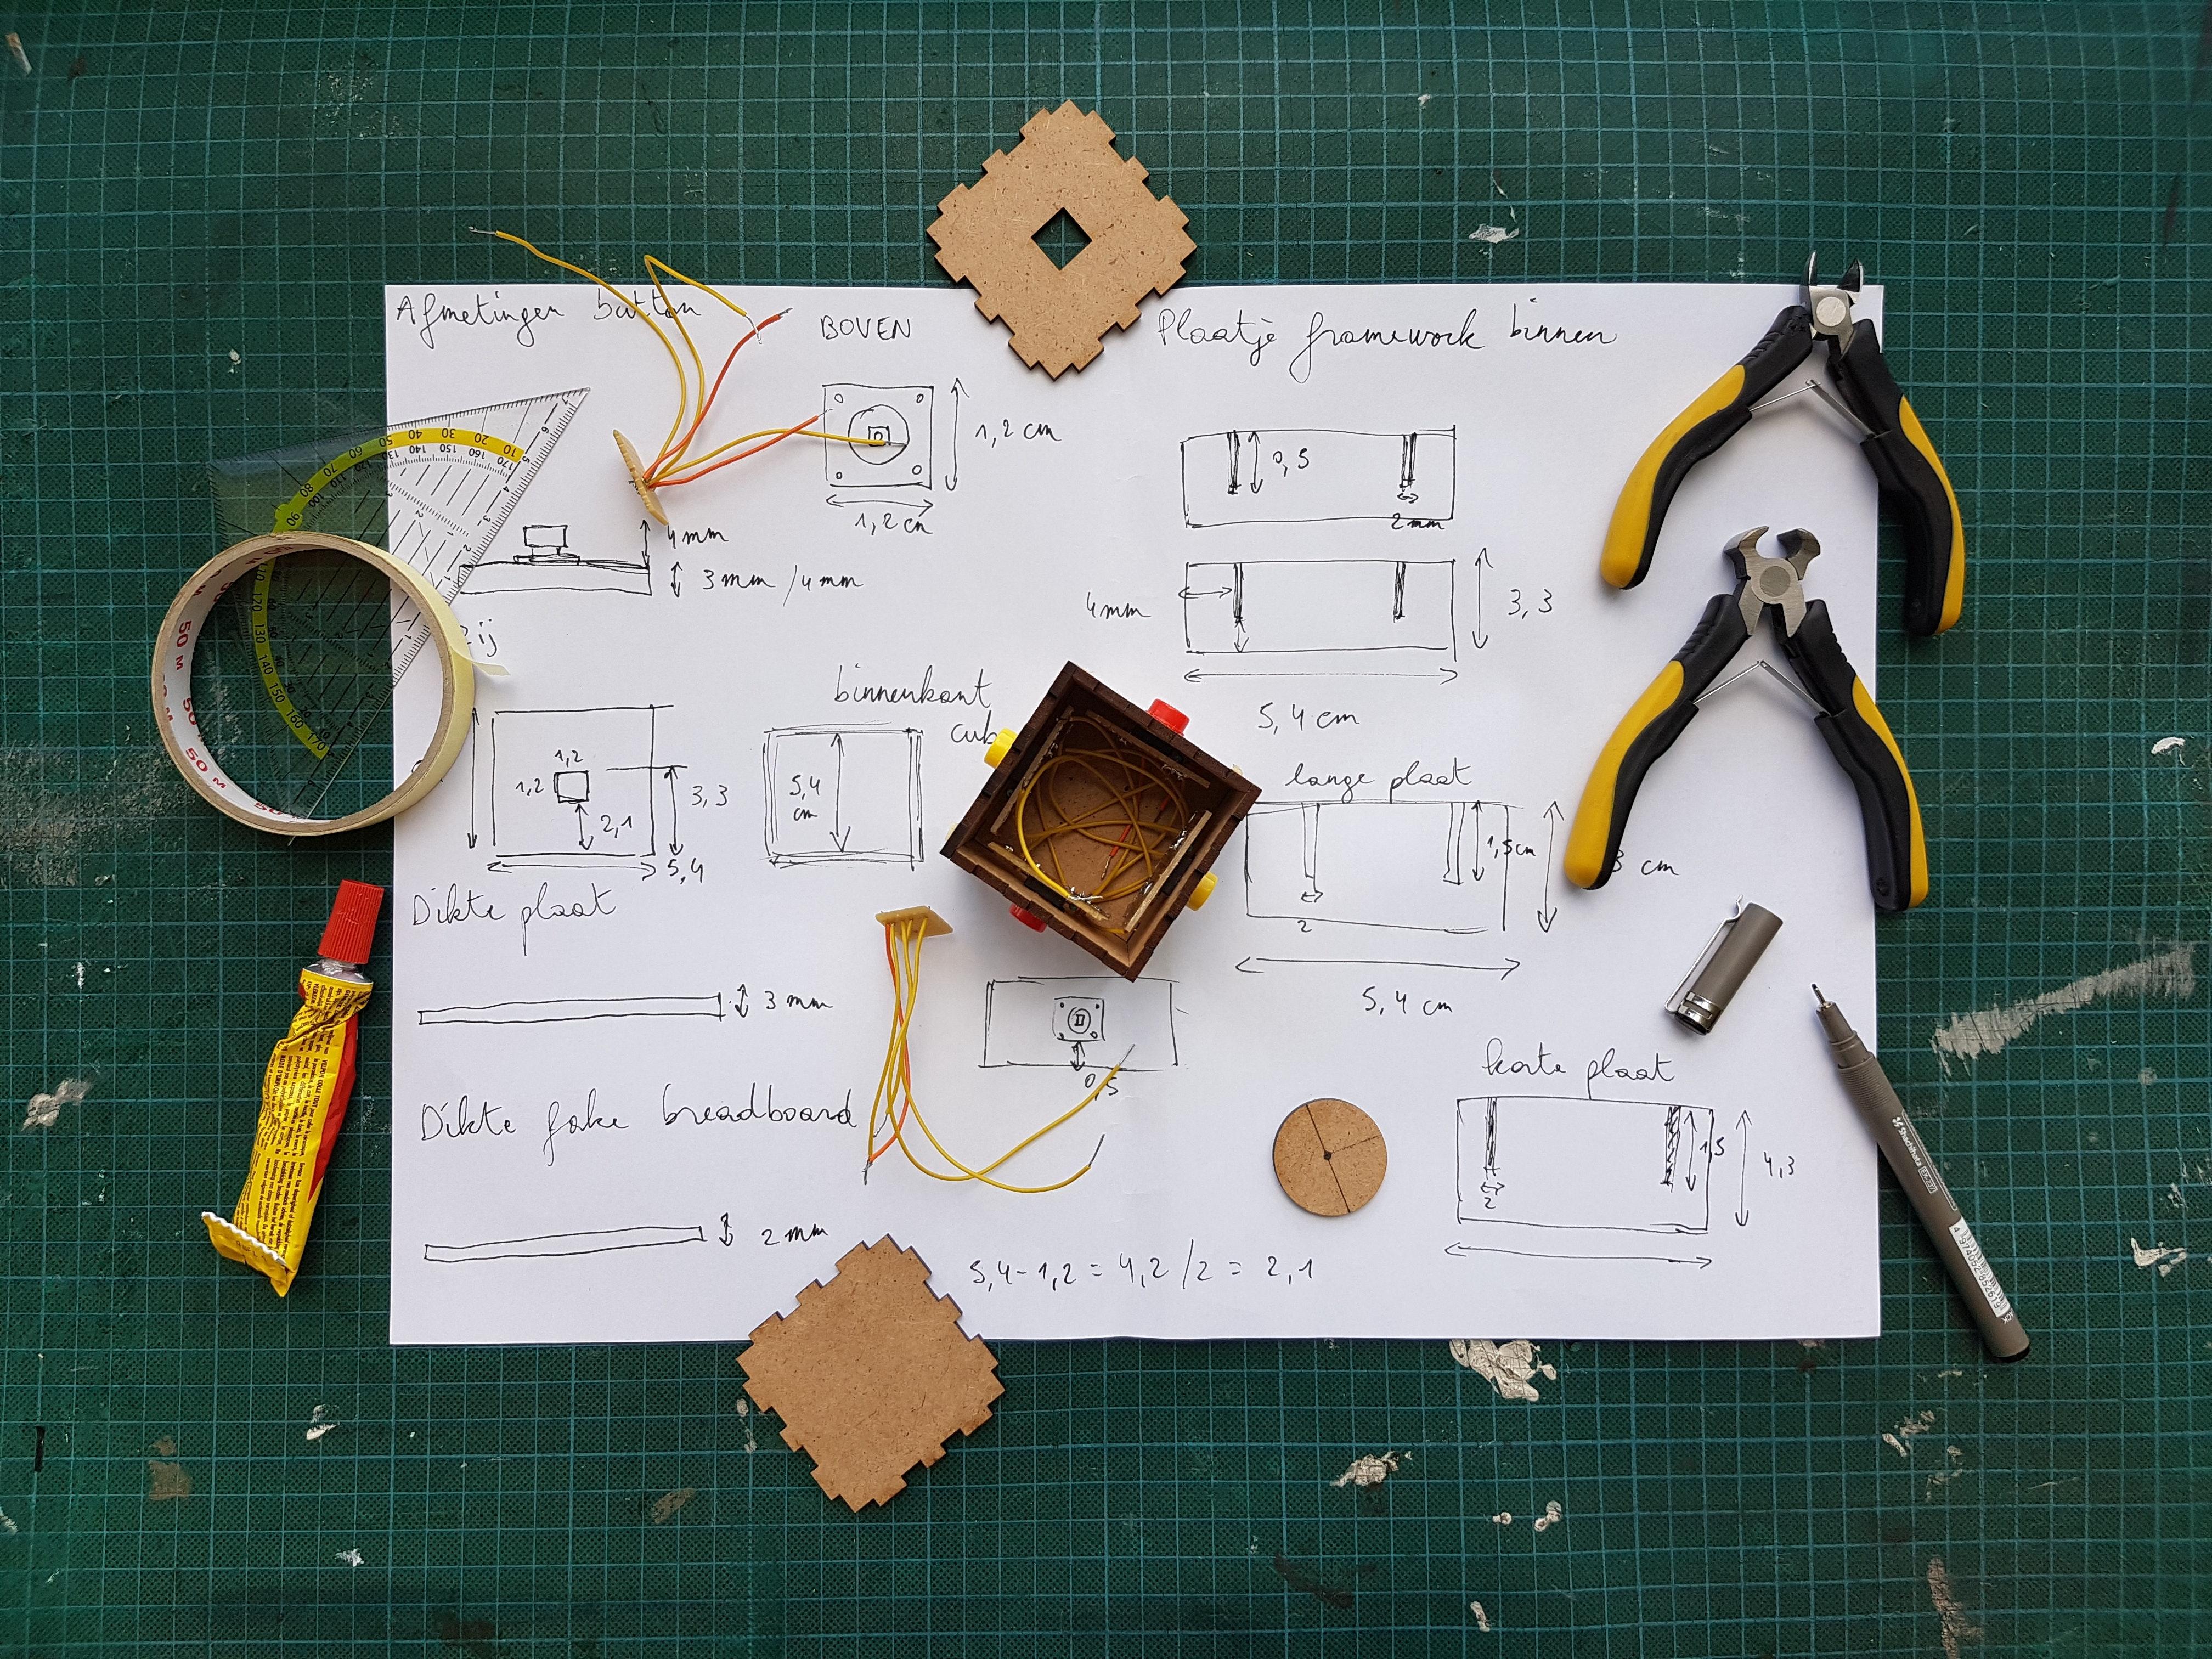 Software development product prototype